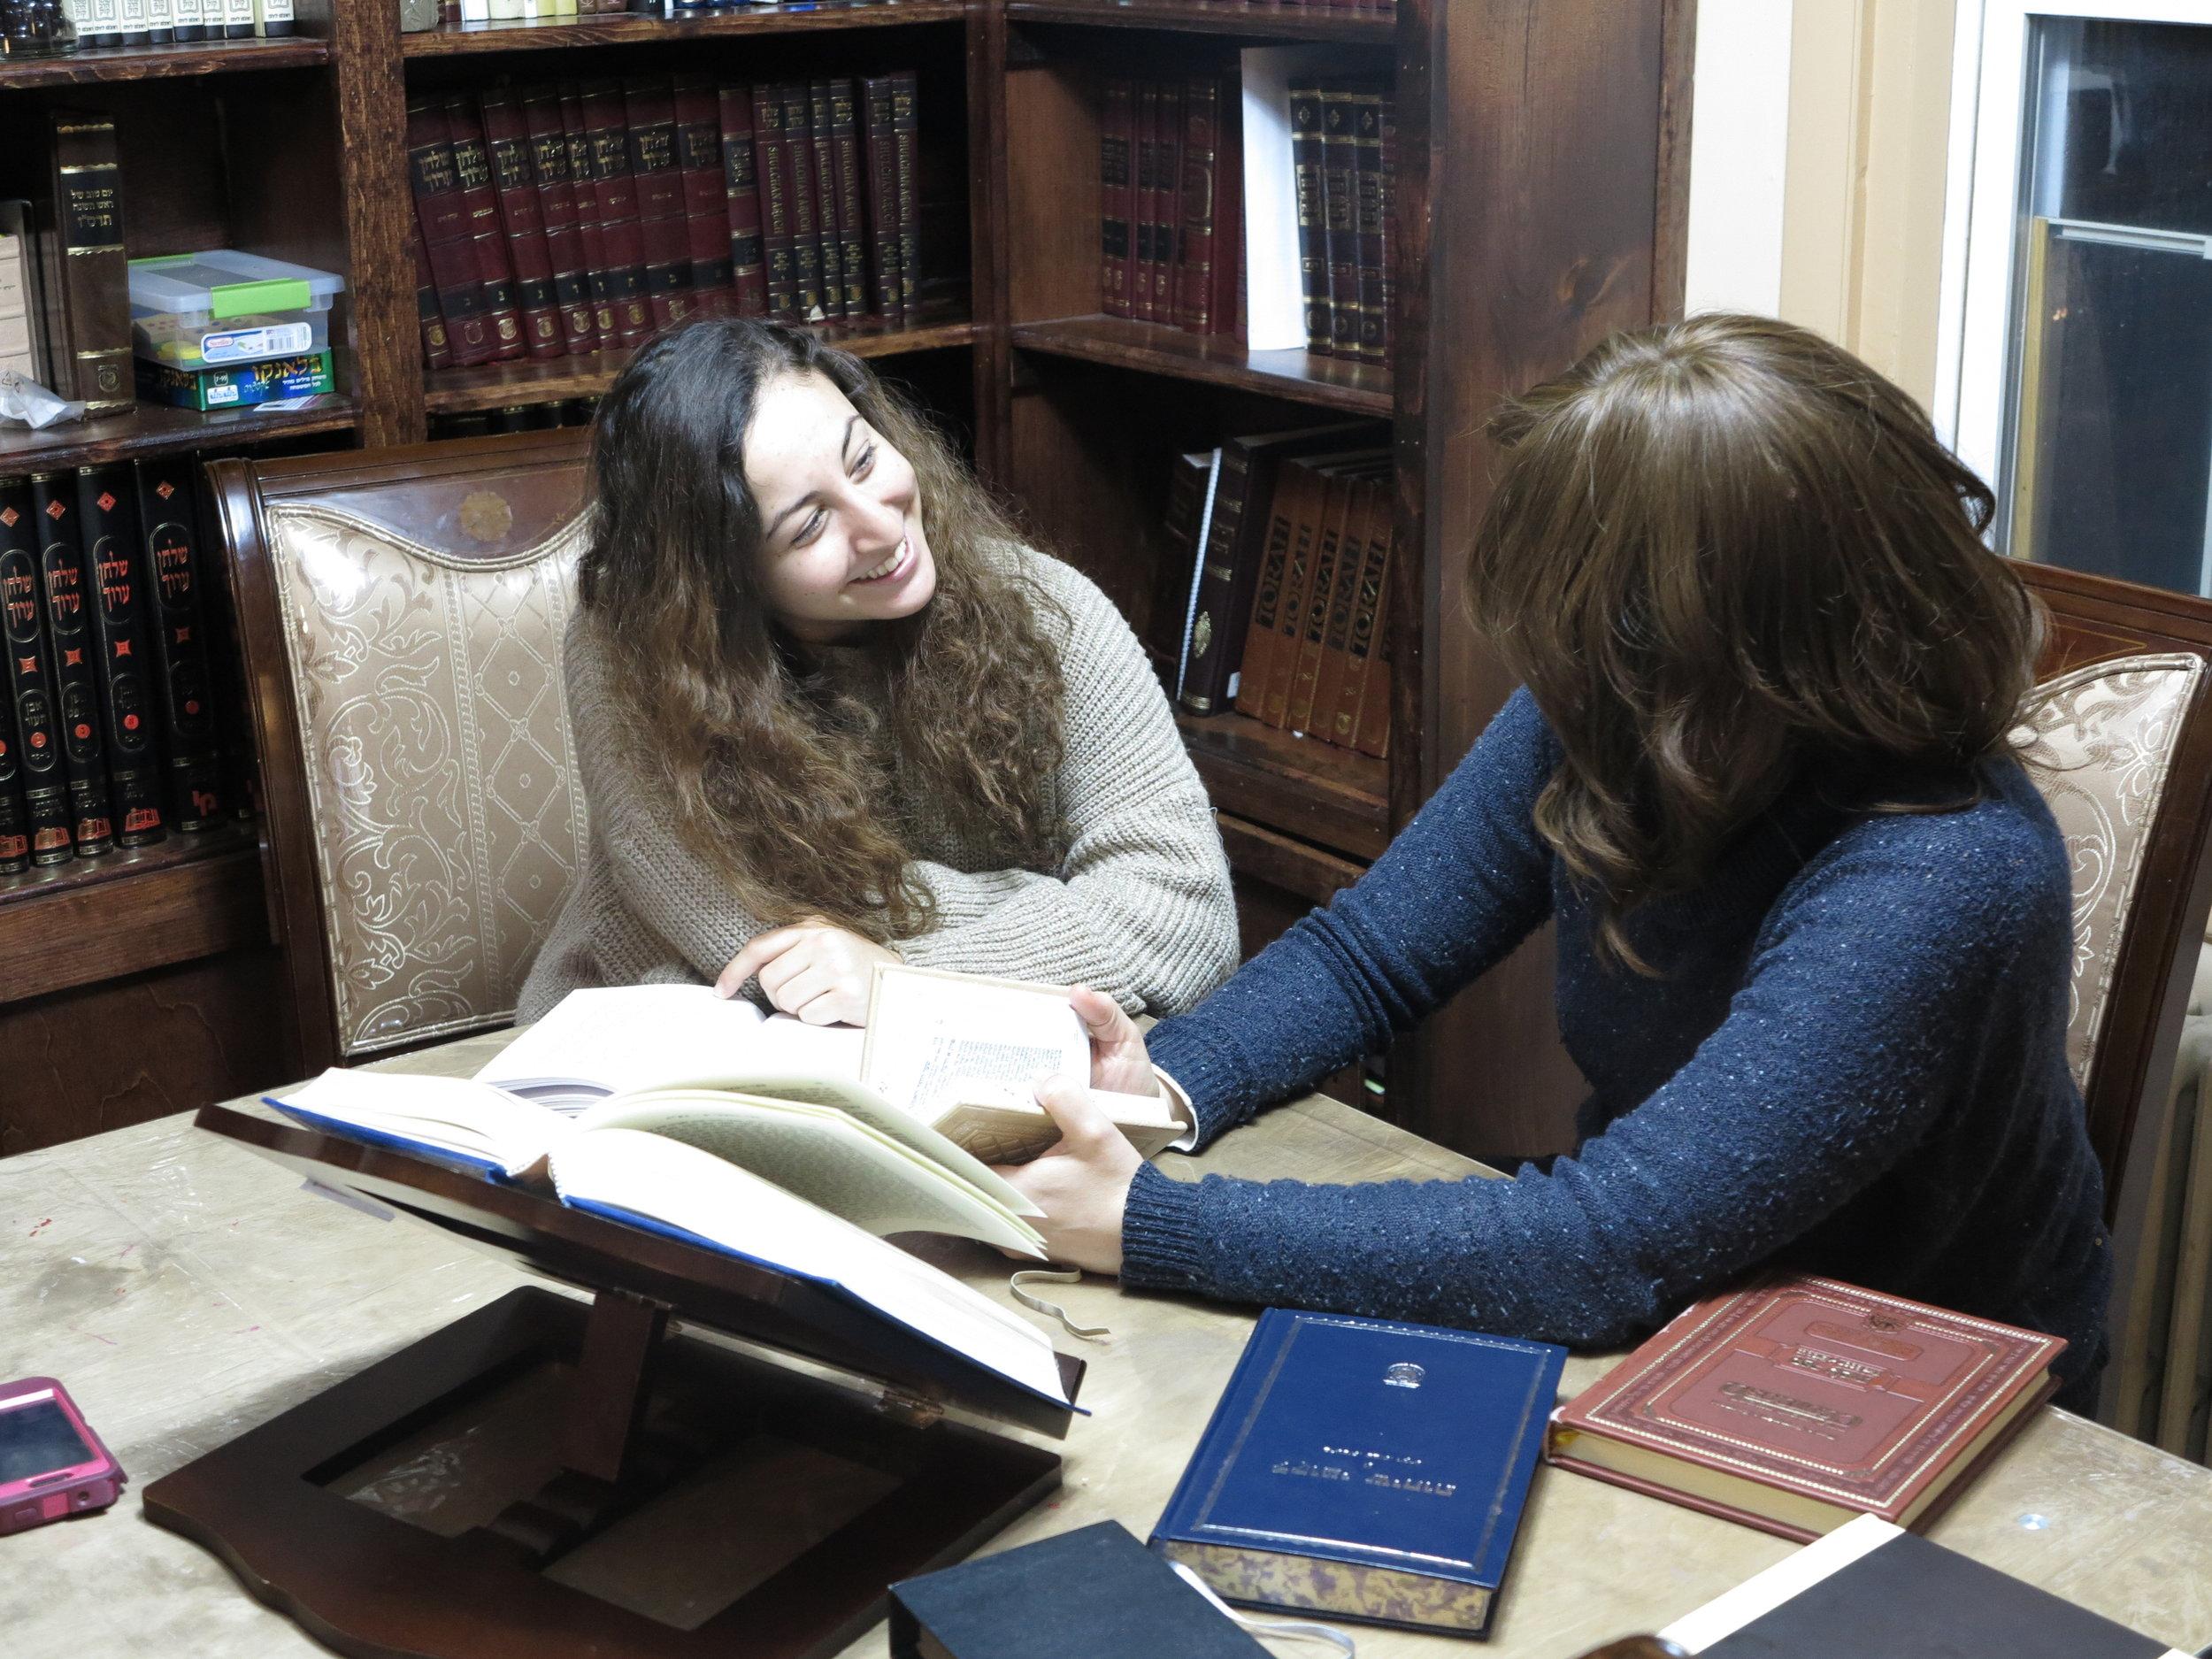 Dalia and a student swimming in the Jewish sea of knowldege